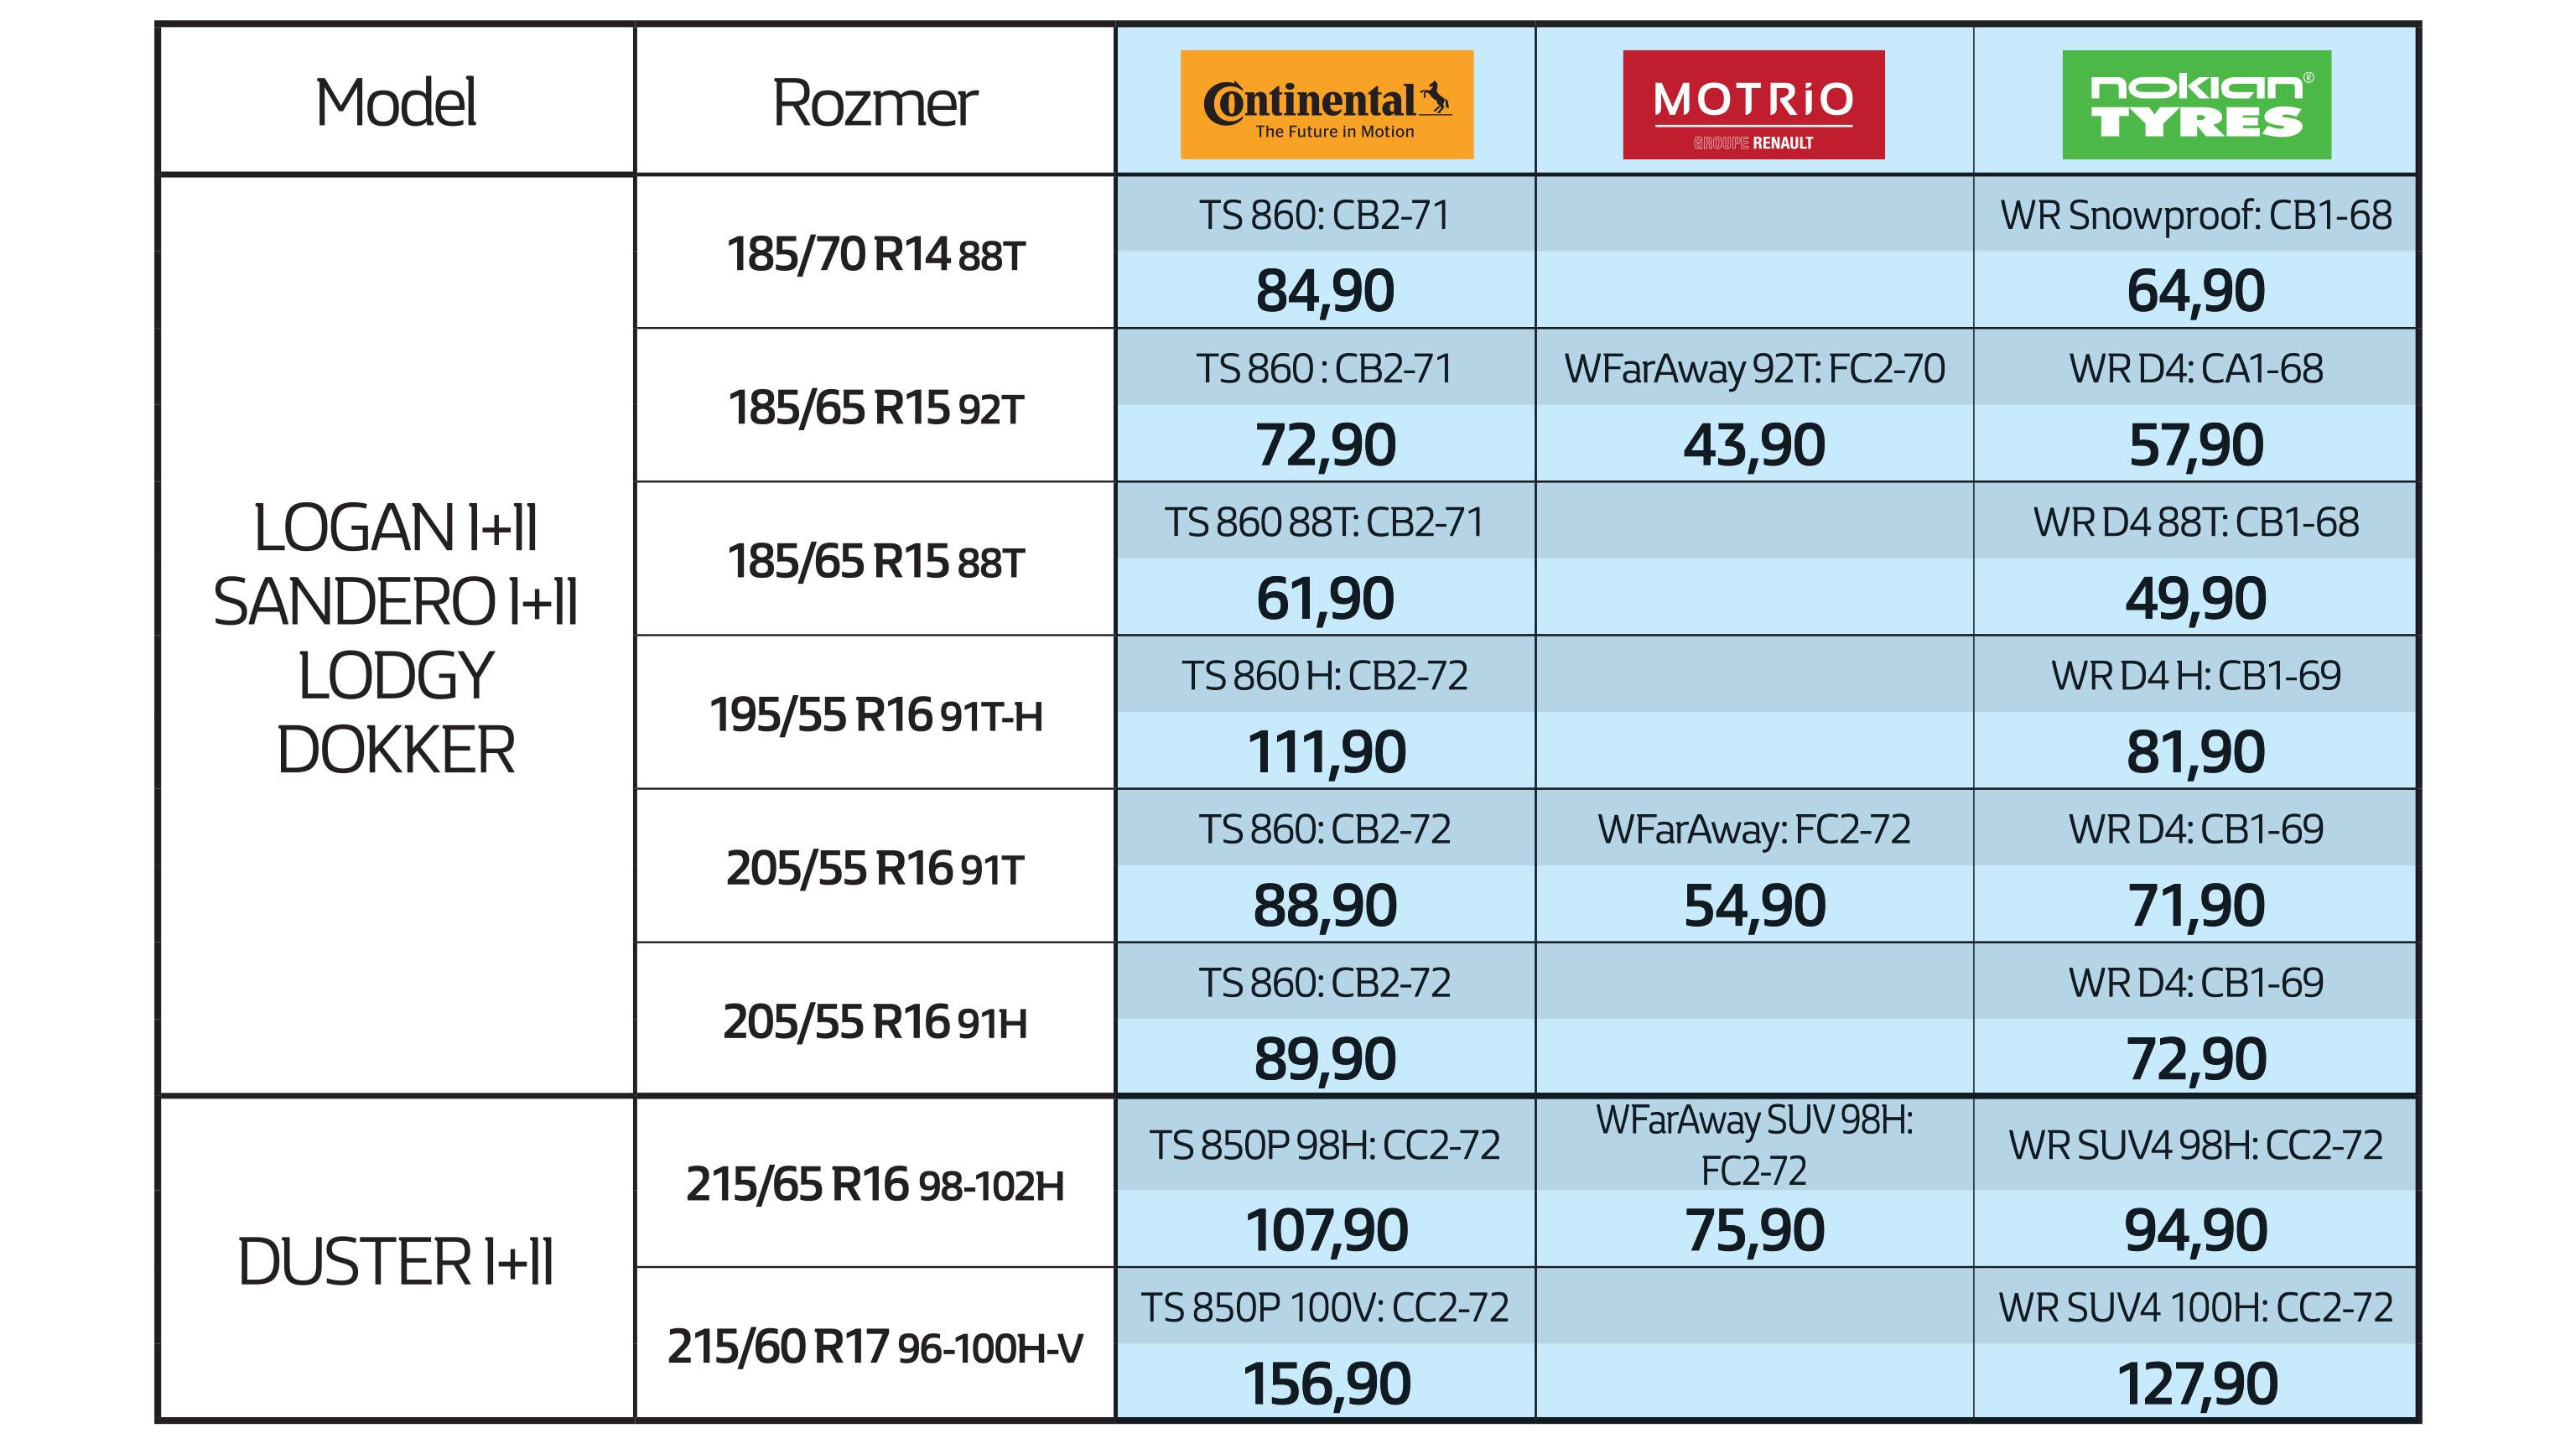 3072x1728-tabela2-sk.jpg